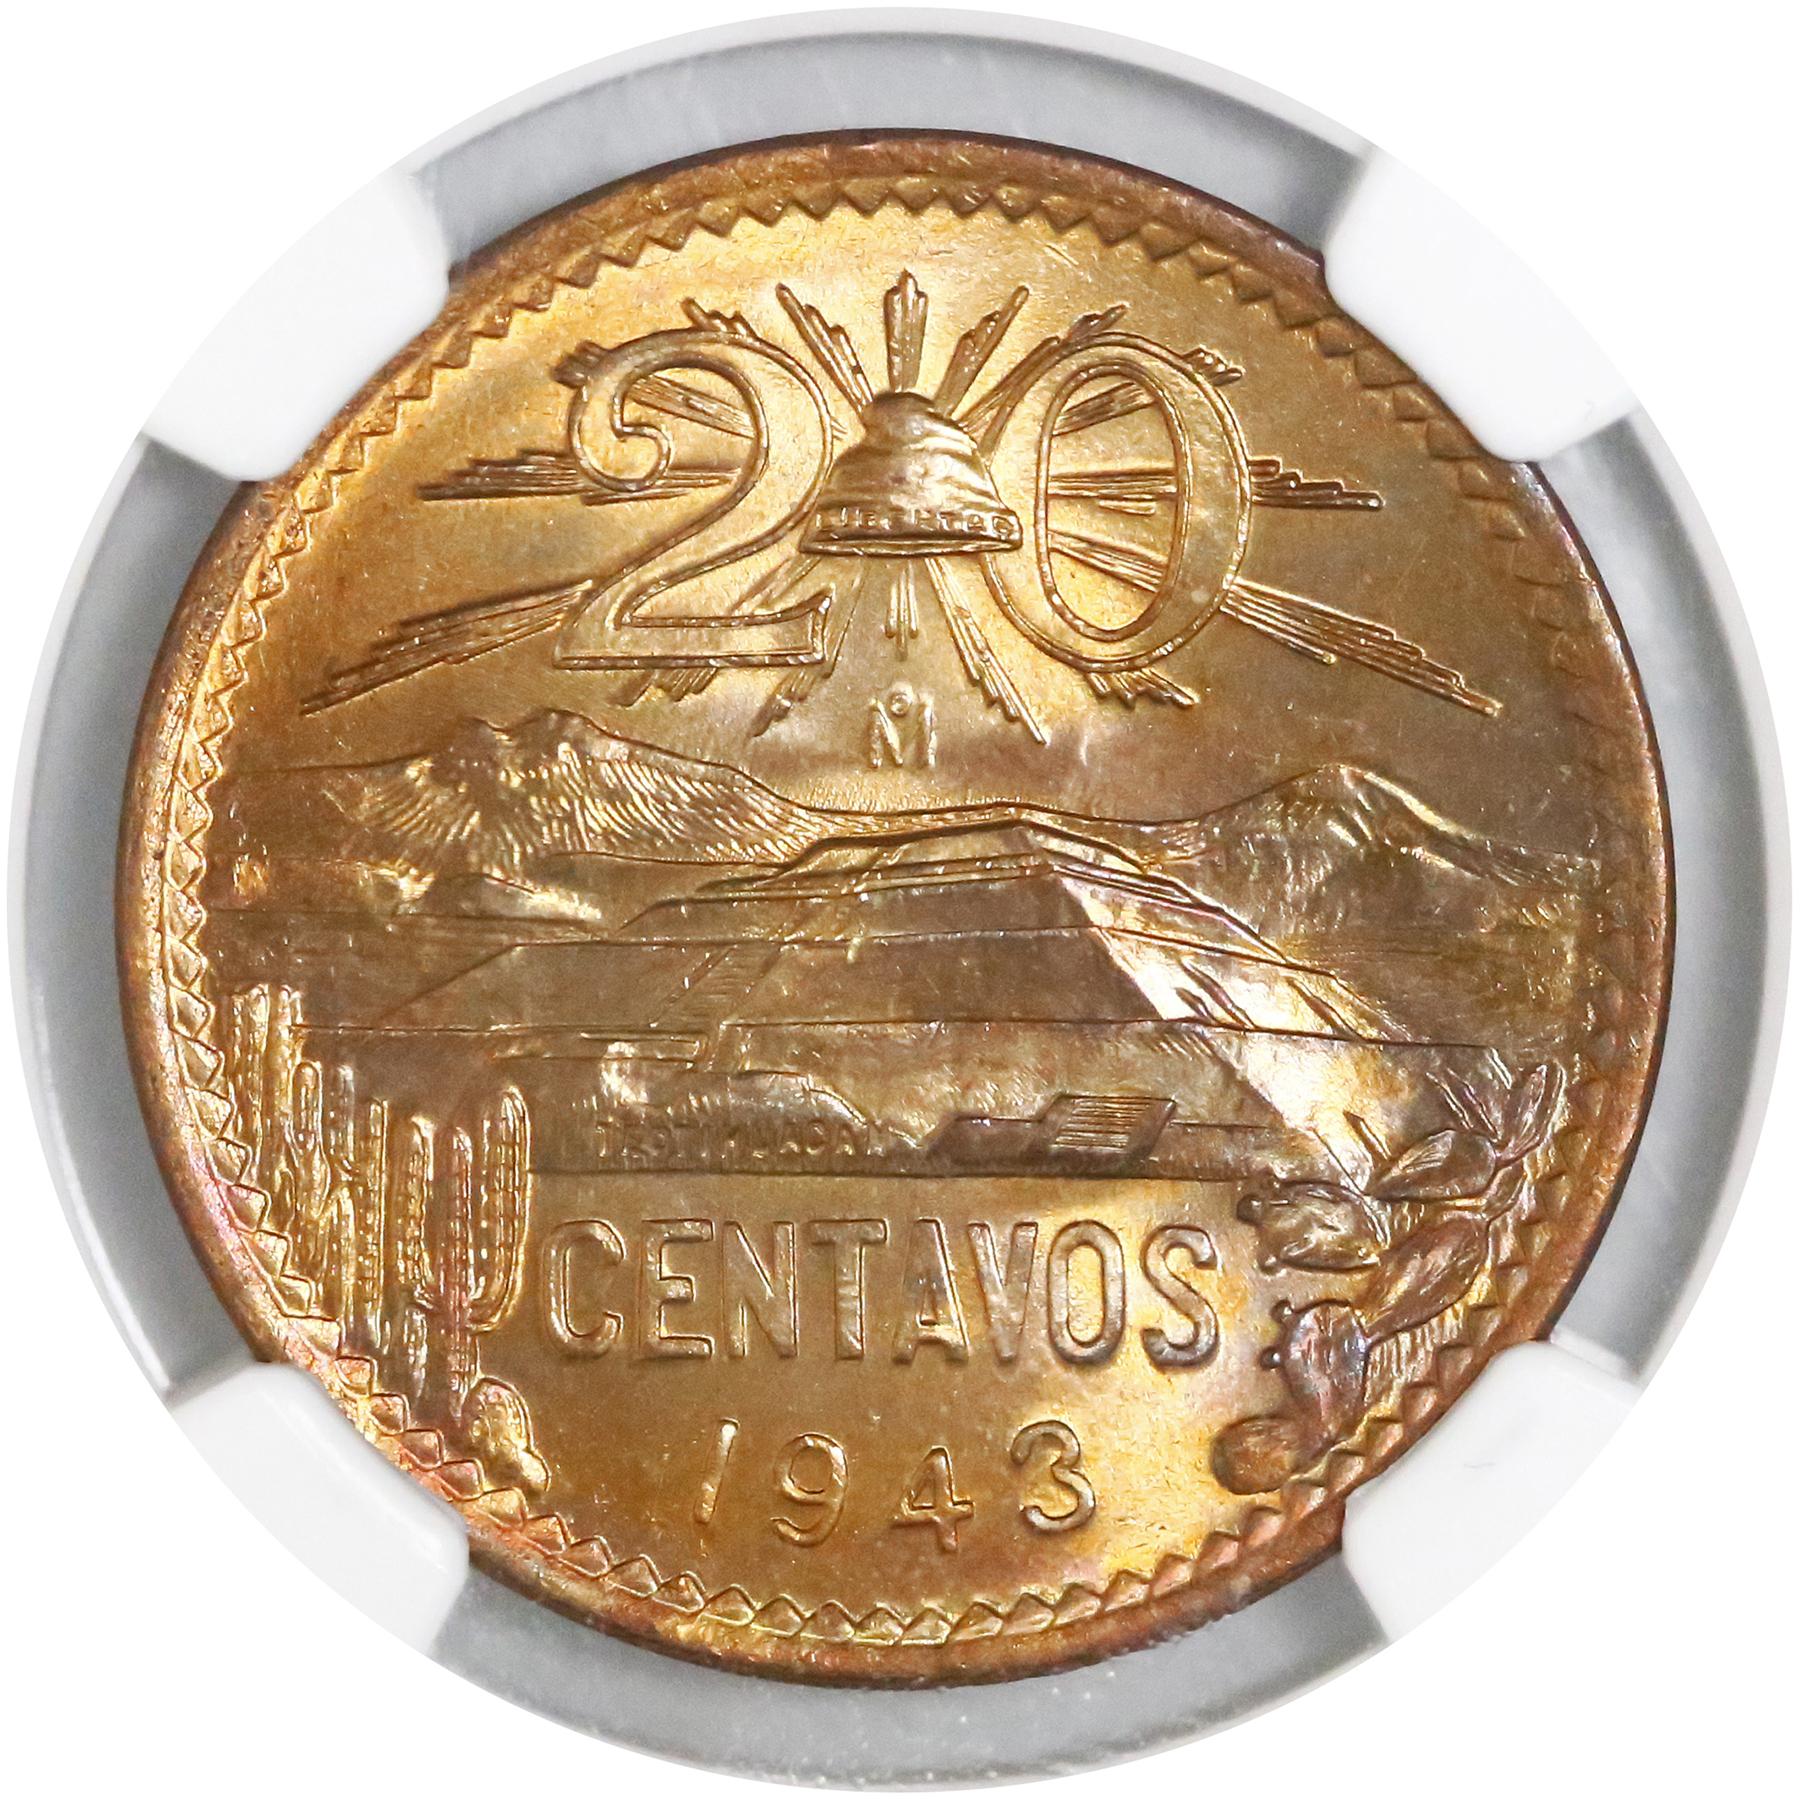 Águila o Sol? The Mexican 20 centavos of 1943-1974 | The Cob